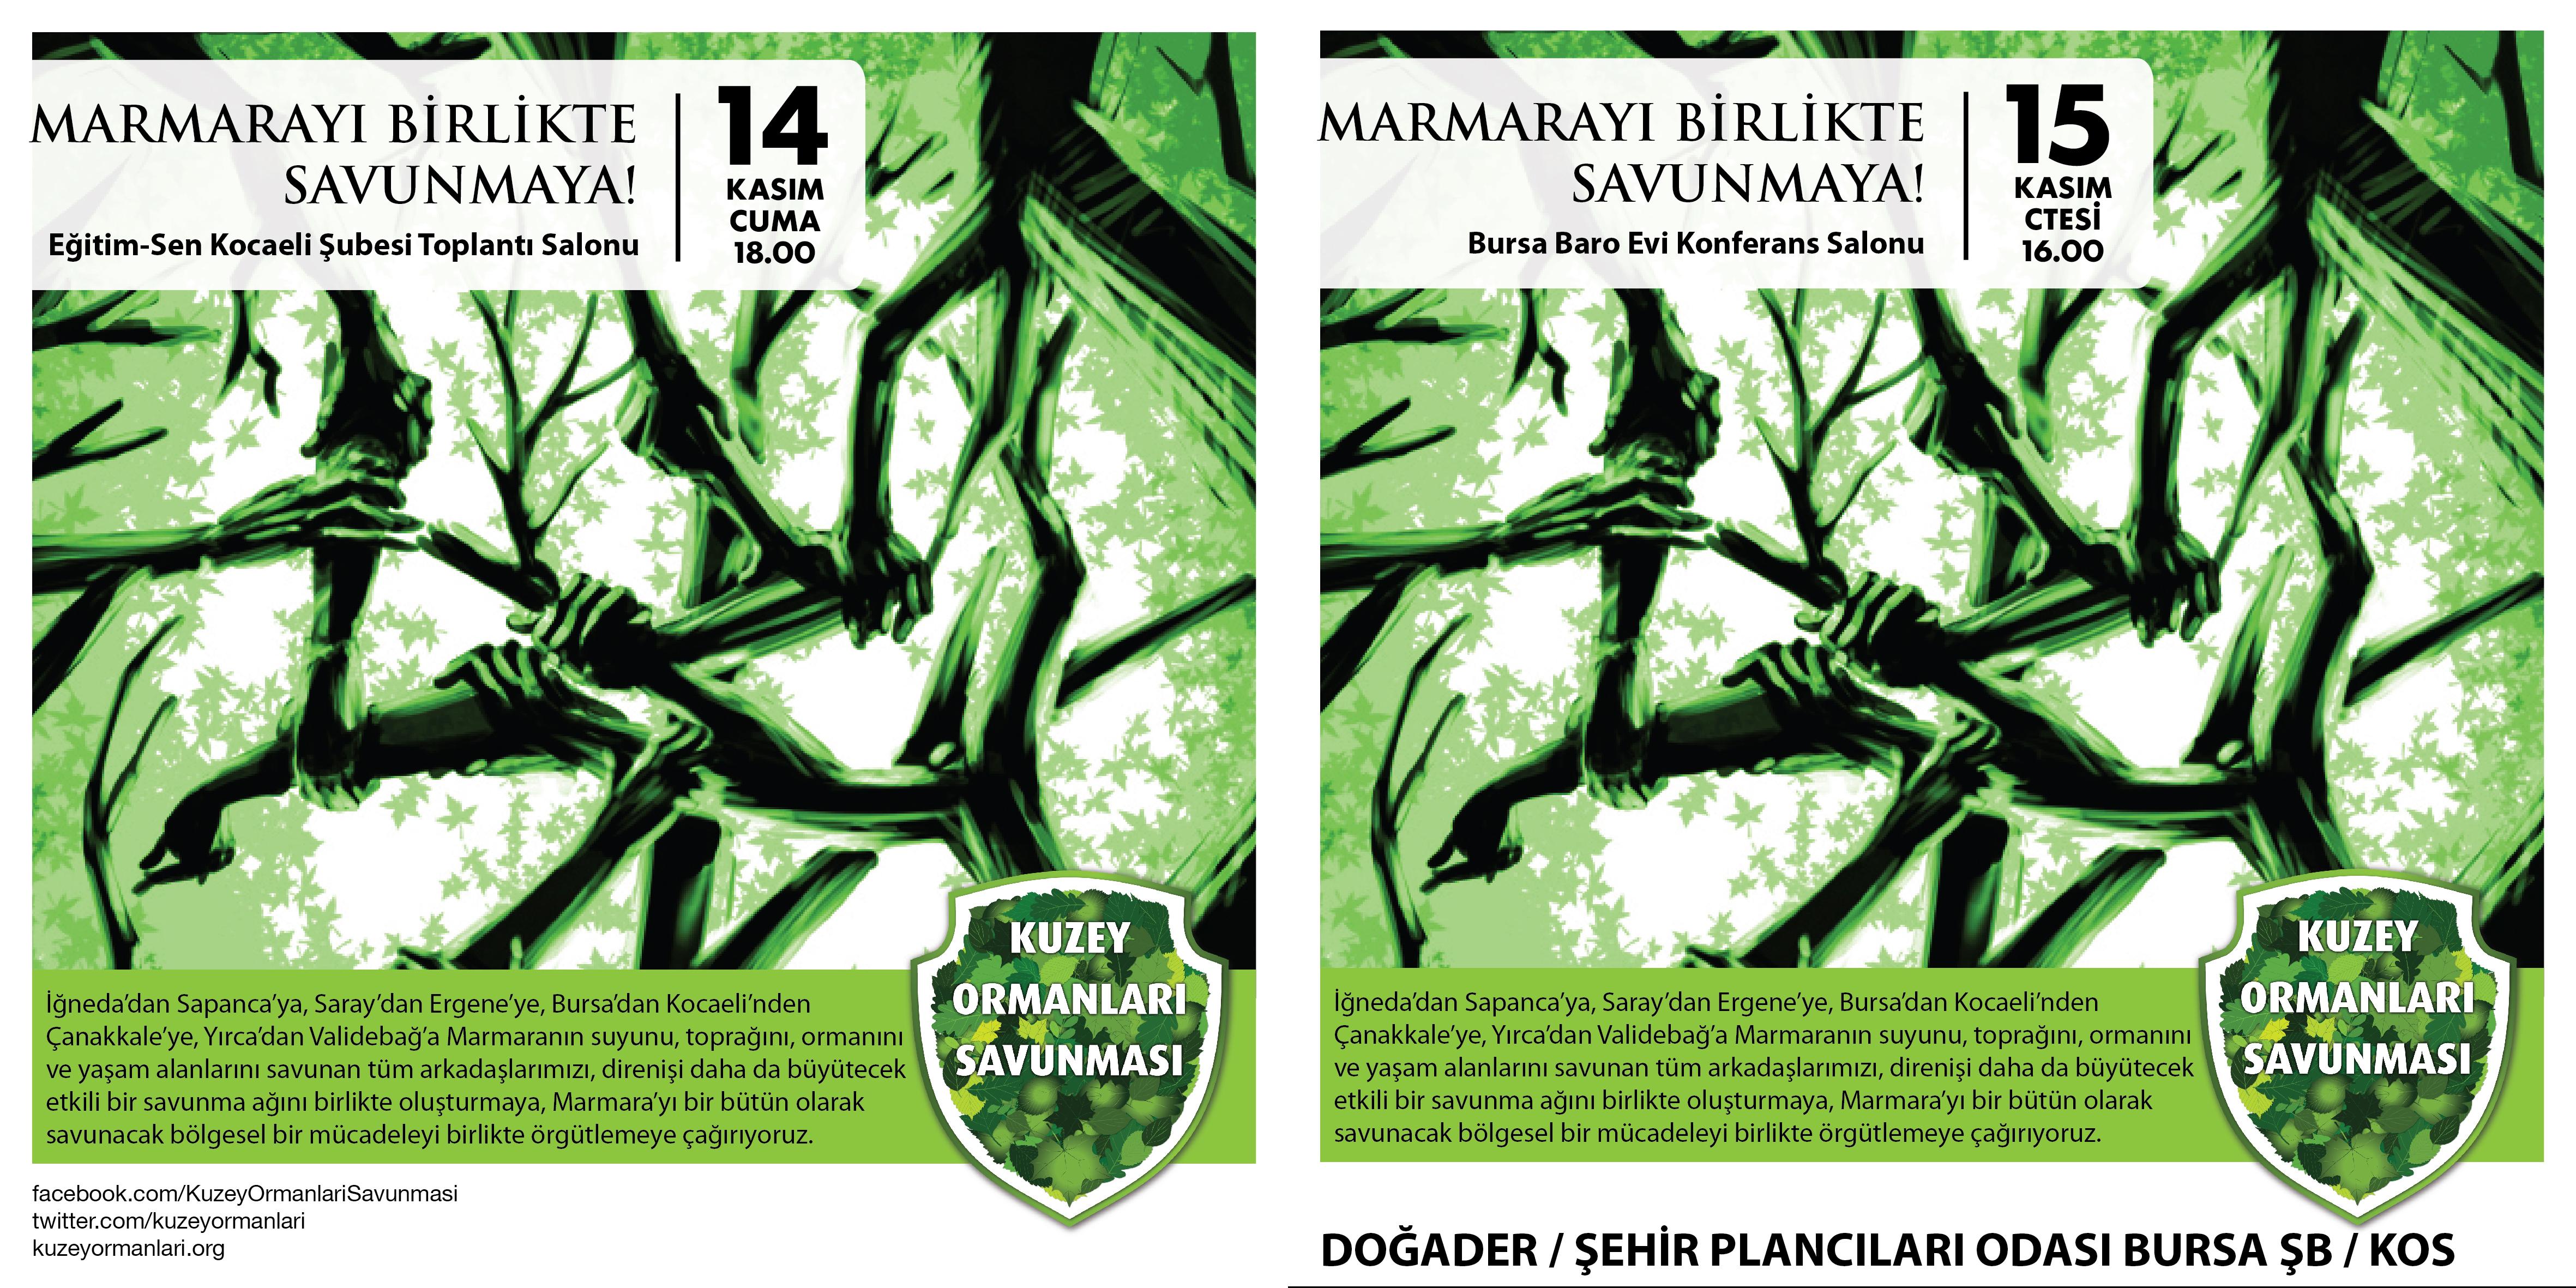 Marmara'yı Birlikte Savunmaya!